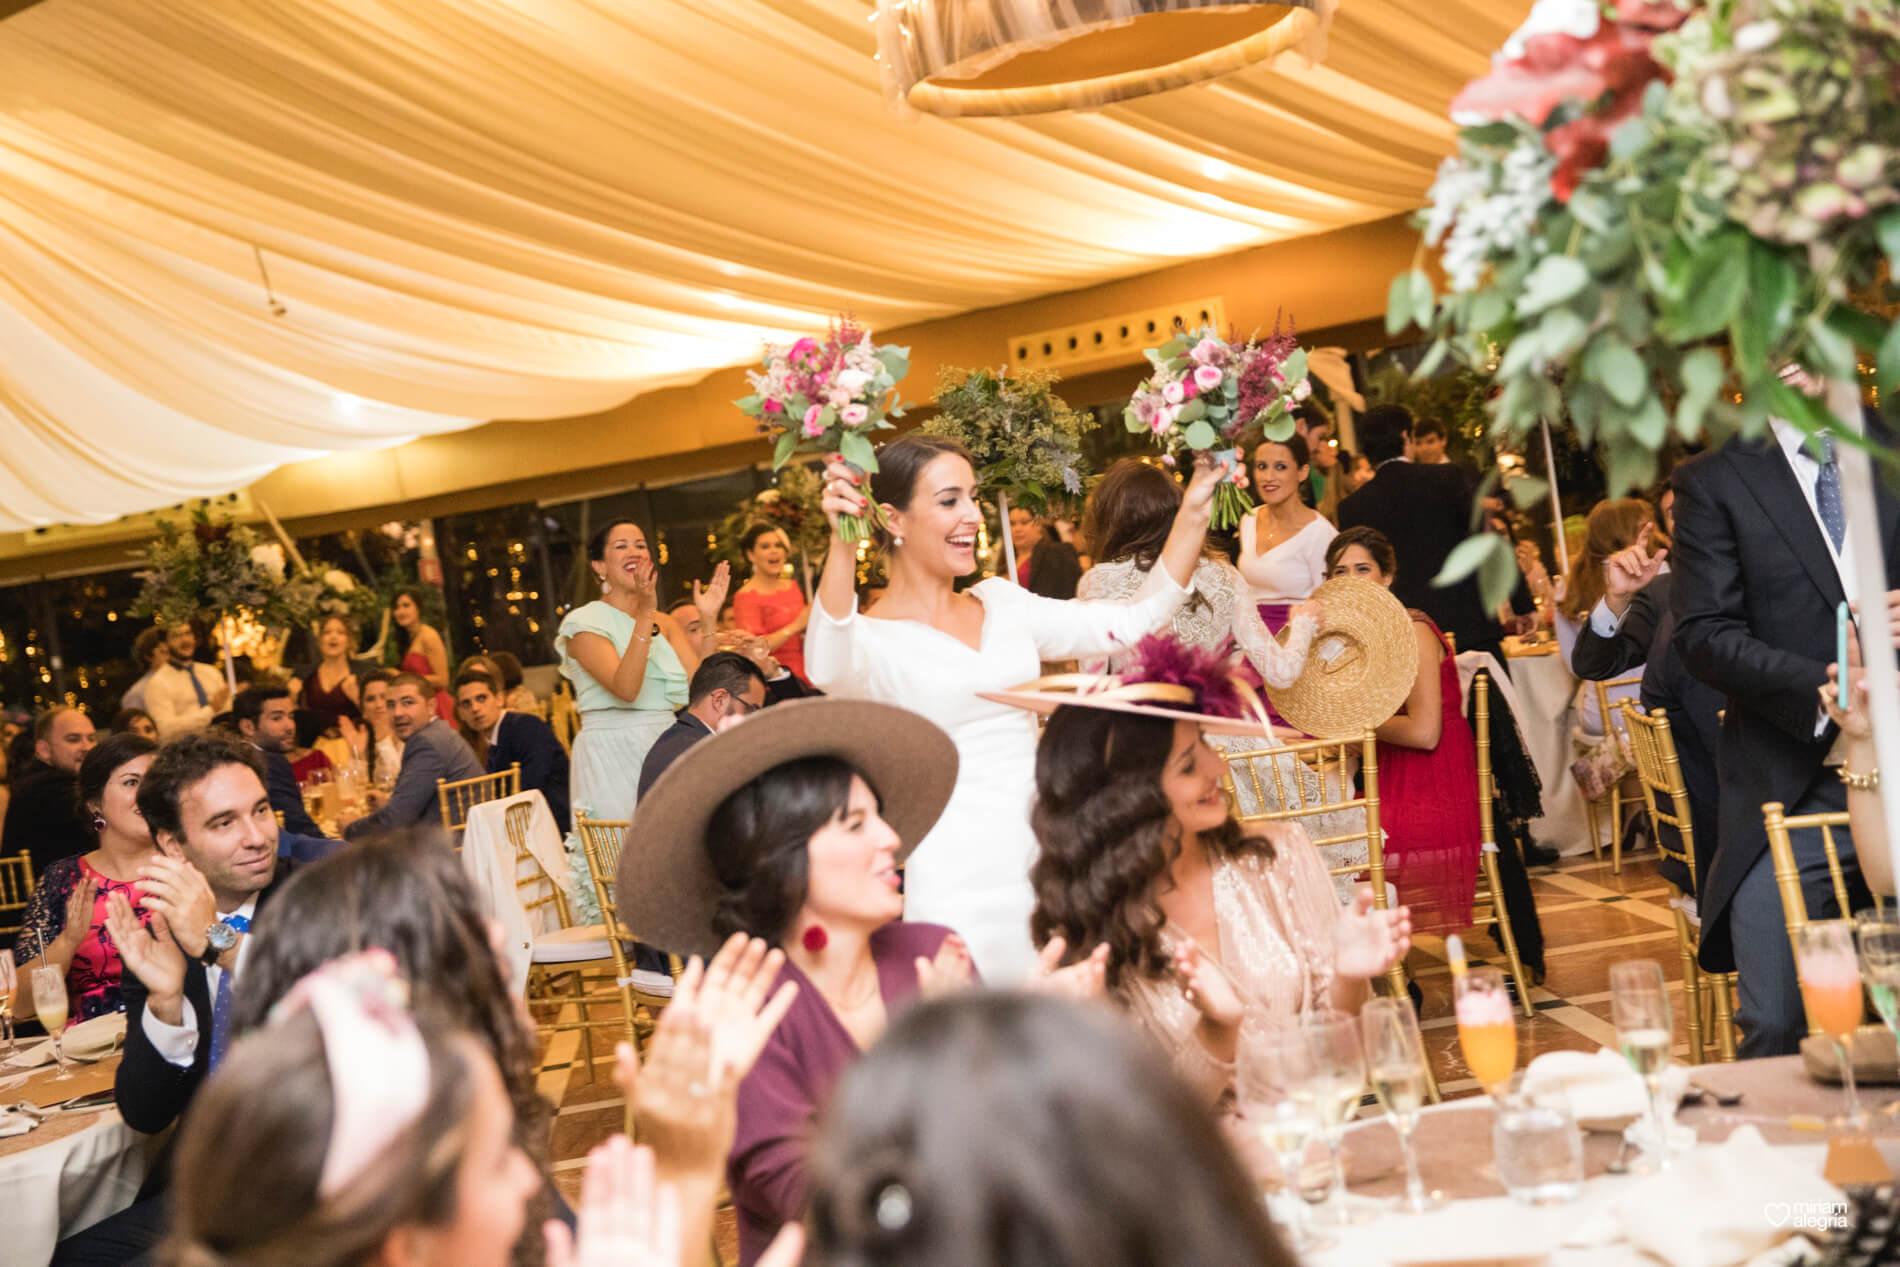 vestido-de-novia-paula-del-vas-miriam-alegria-fotografos-boda-murcia-127